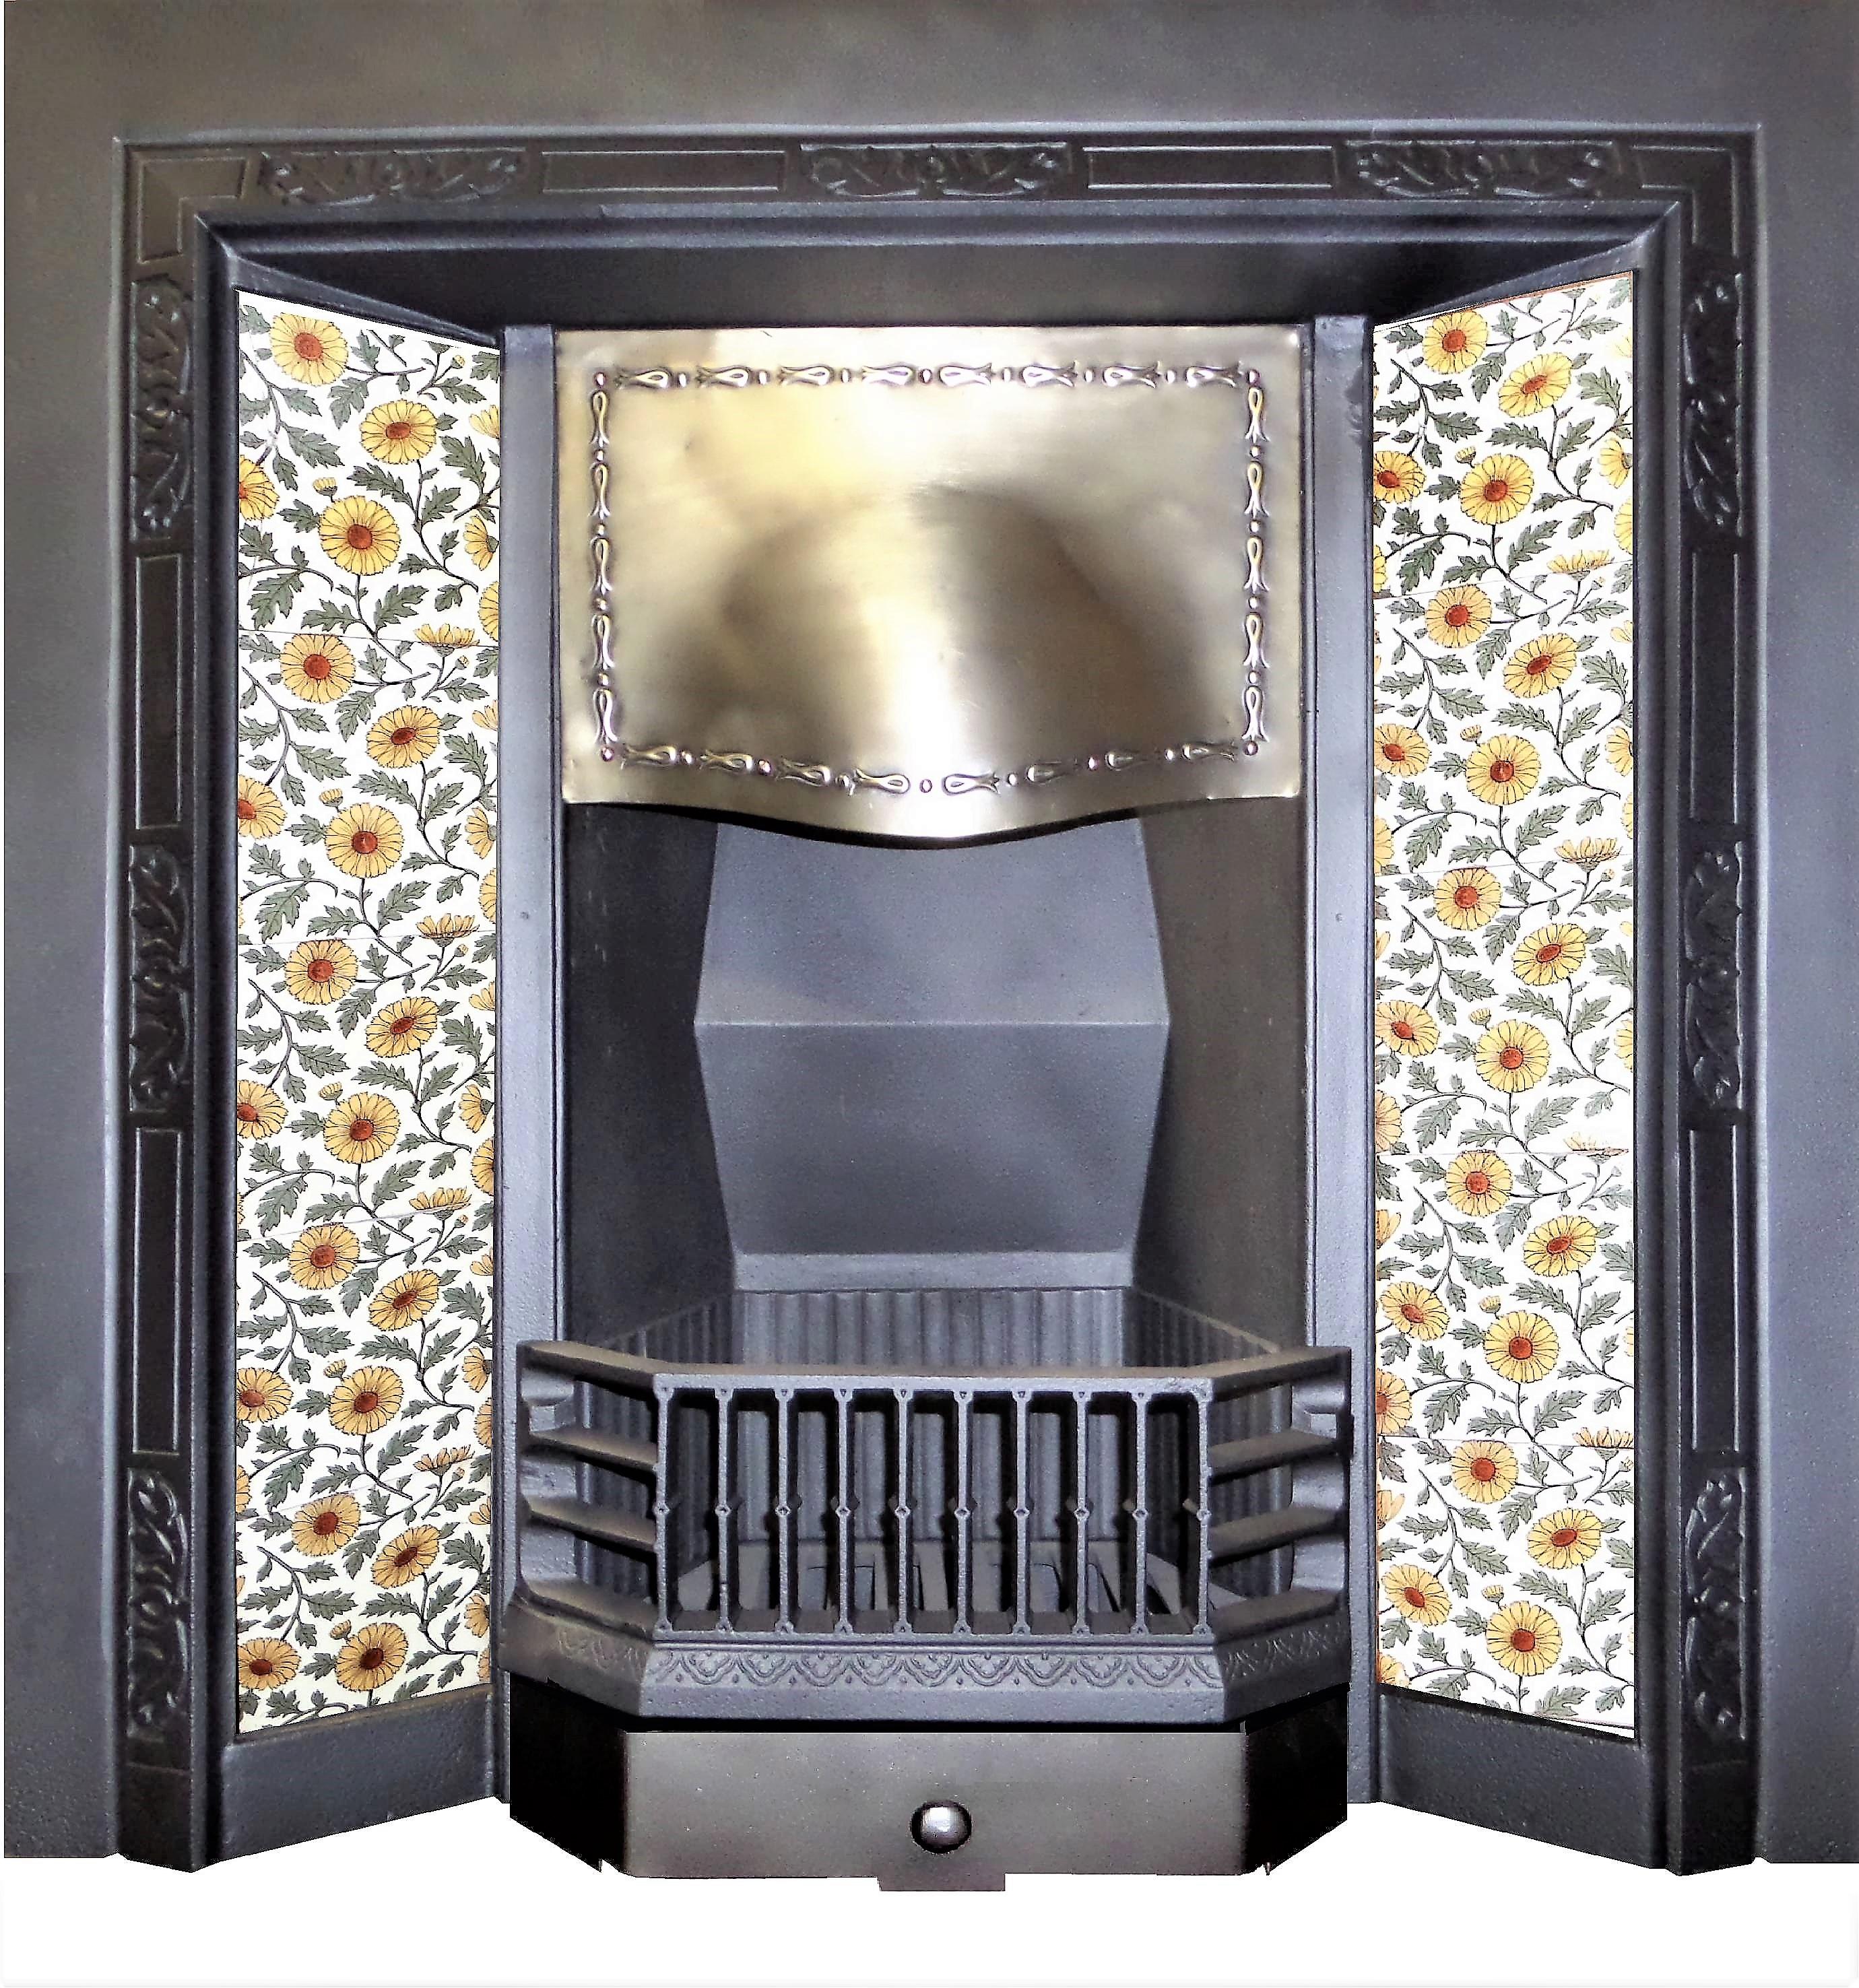 Marvelous Buy Online Antique Edwardian Brass Tiled Cast Iron Download Free Architecture Designs Pushbritishbridgeorg